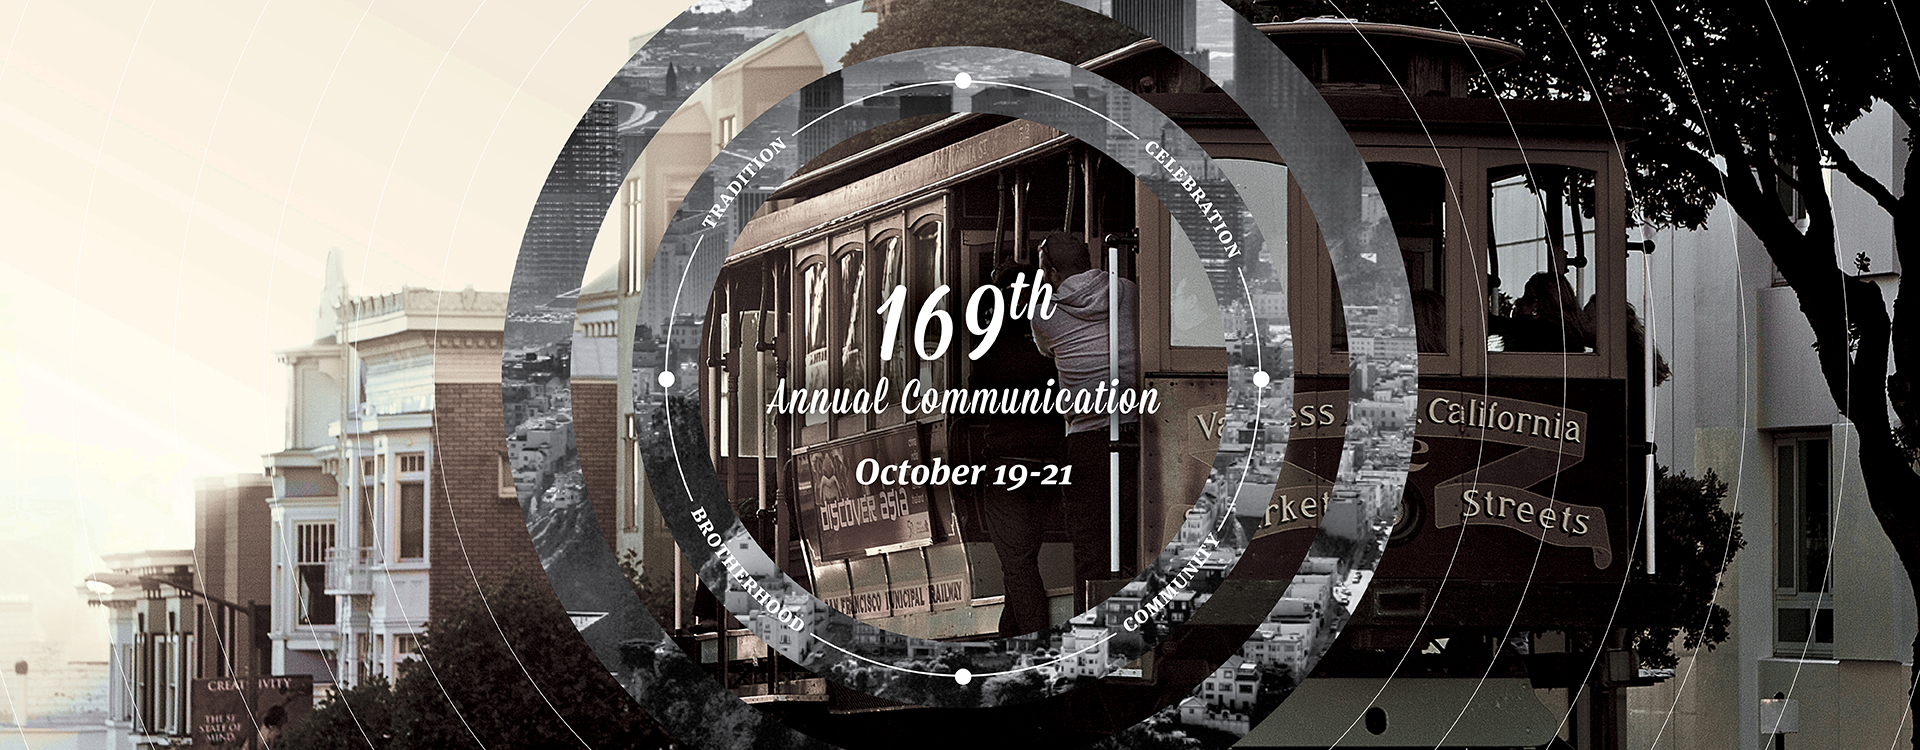 2018 Annual Communication